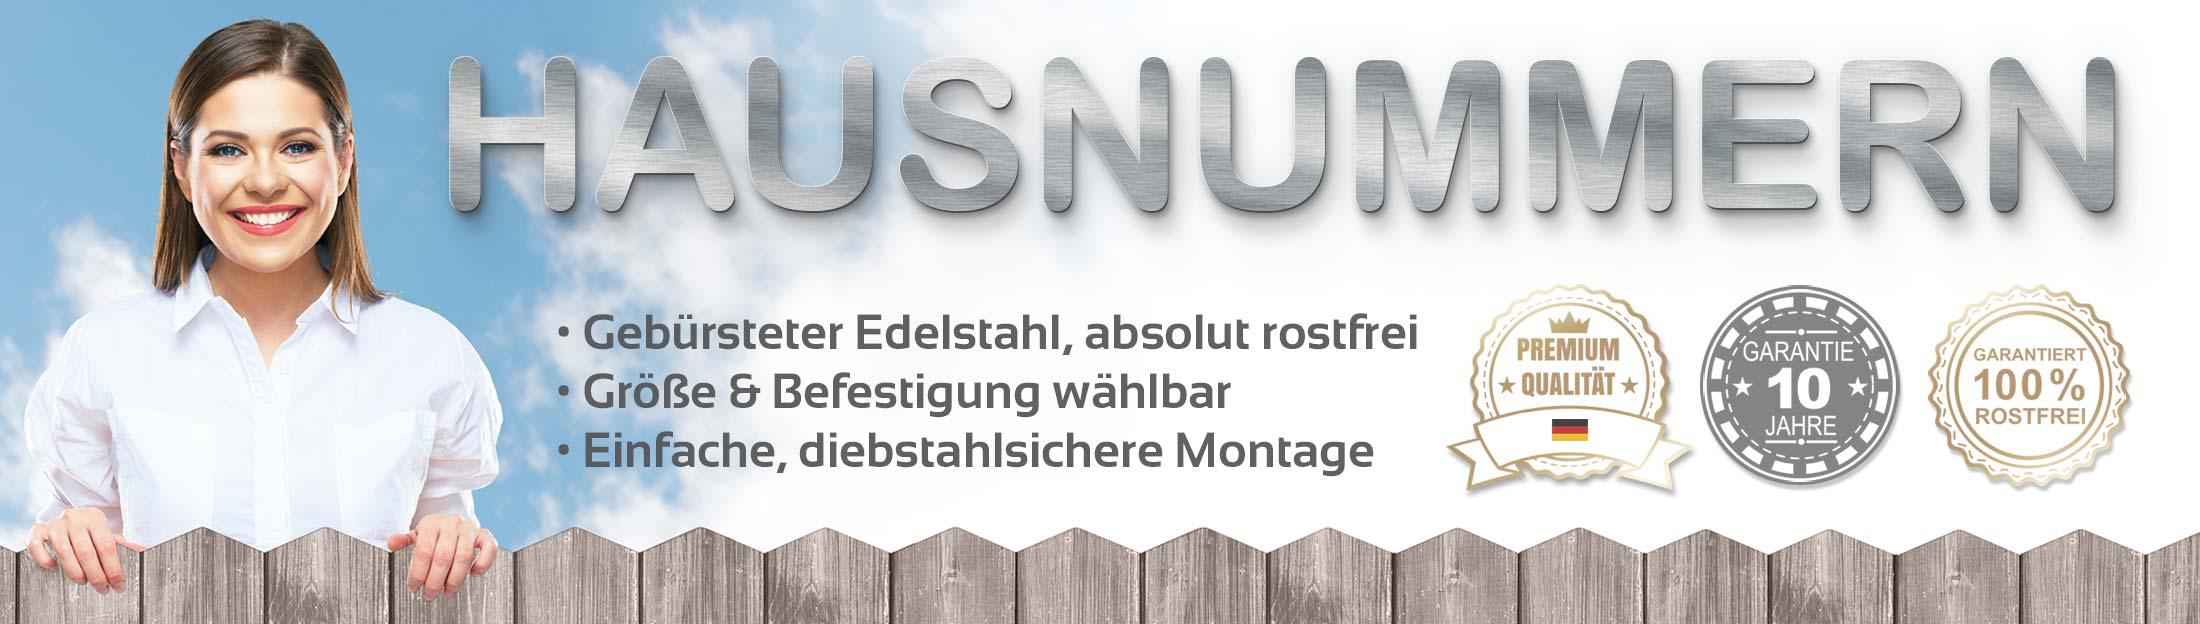 Signostar - Hausnummern aus Edelstahl